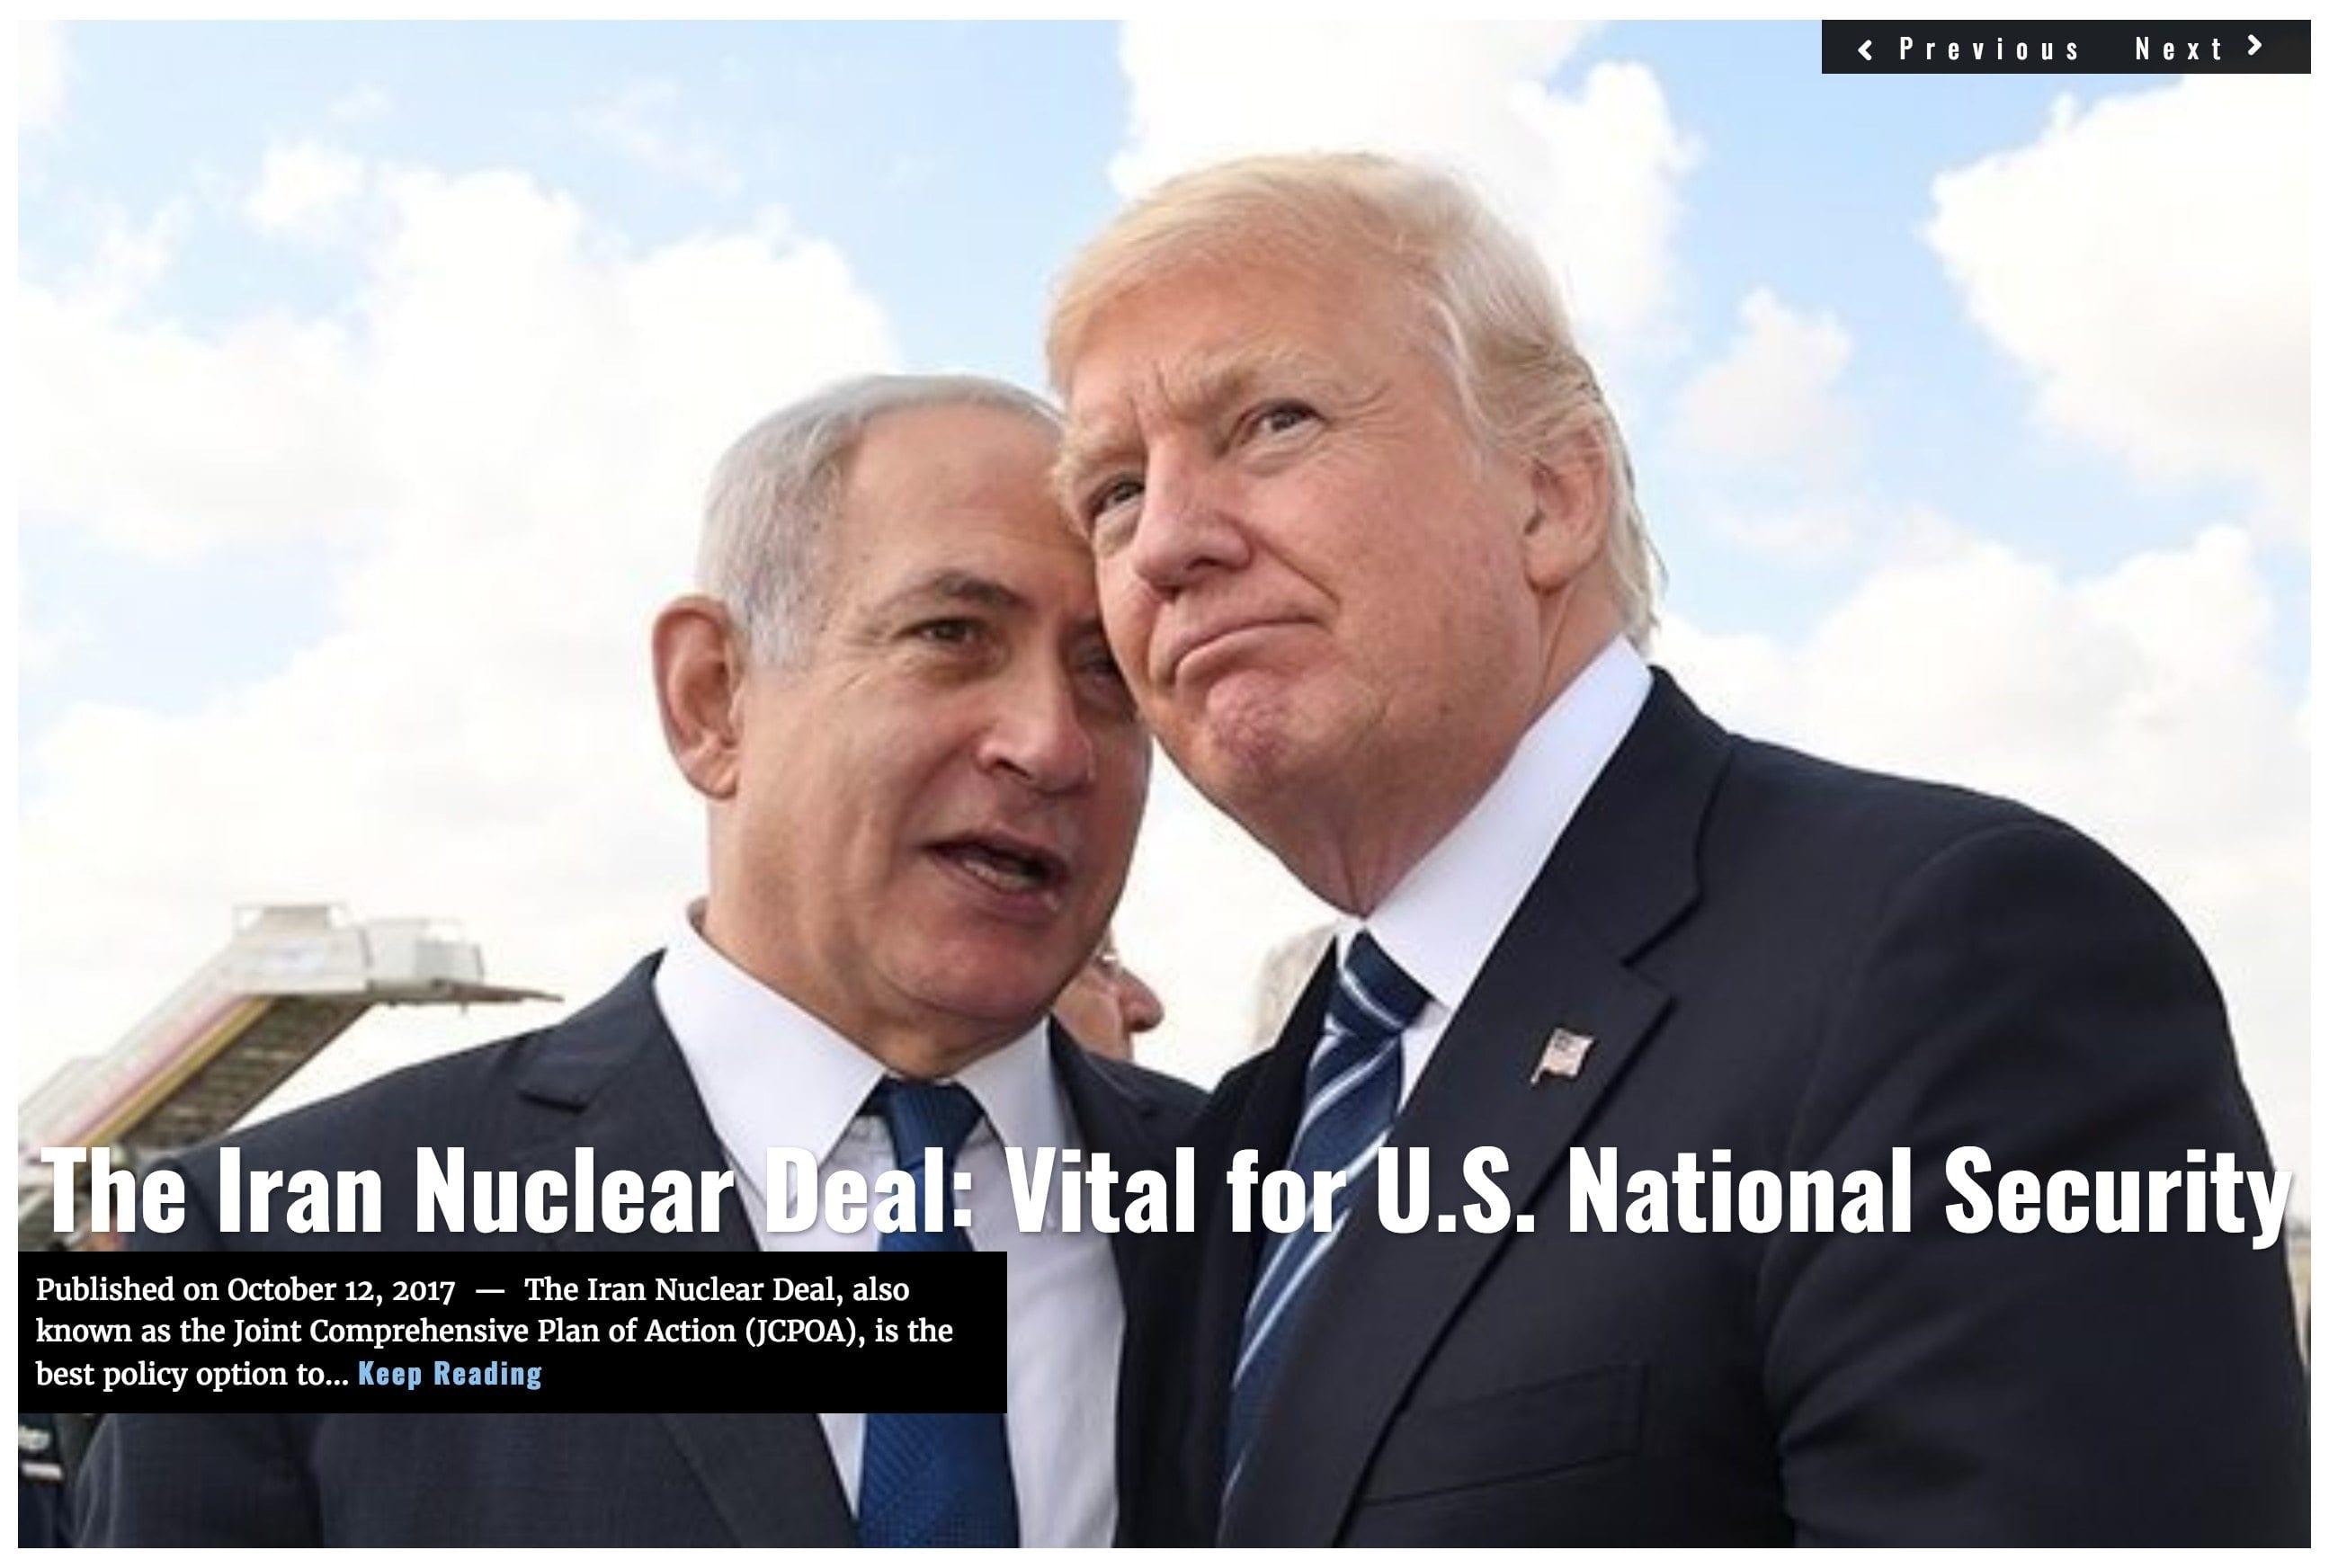 Image Lima Charlie News Headline Iran Nuclear Castelberry OCT12